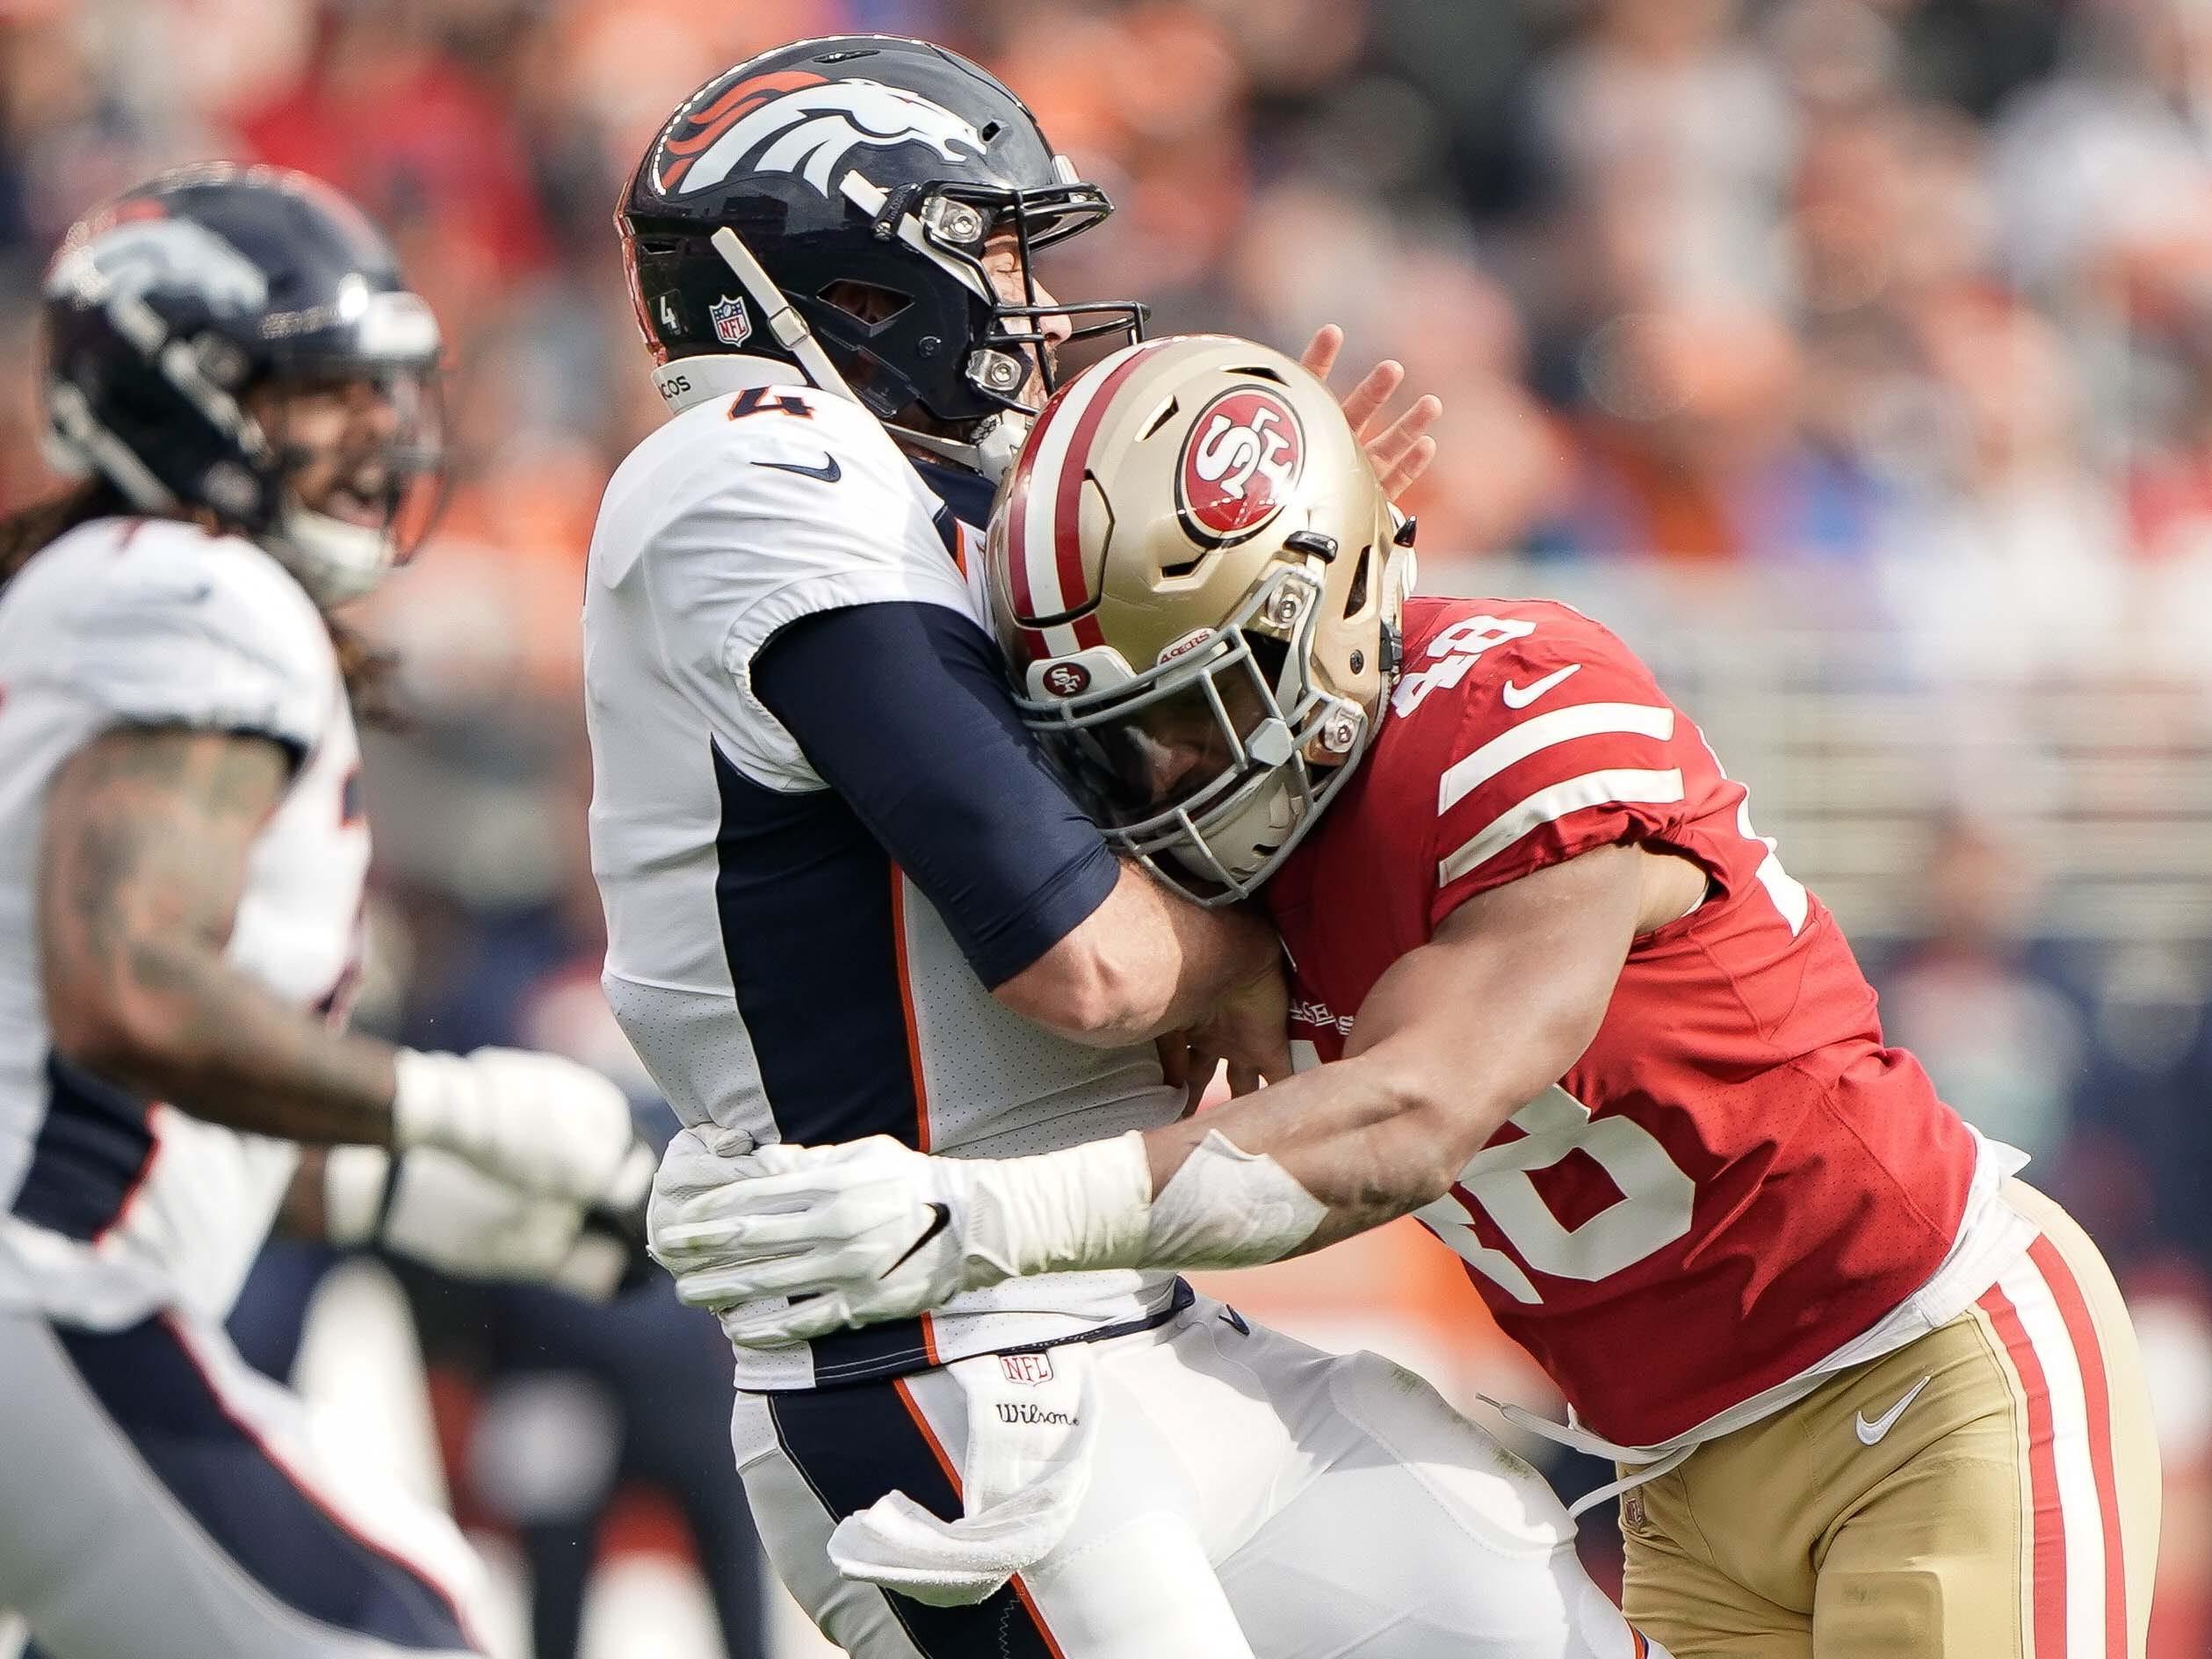 49ers linebacker Fred Warner hits Broncos quarterback Case Keenum.